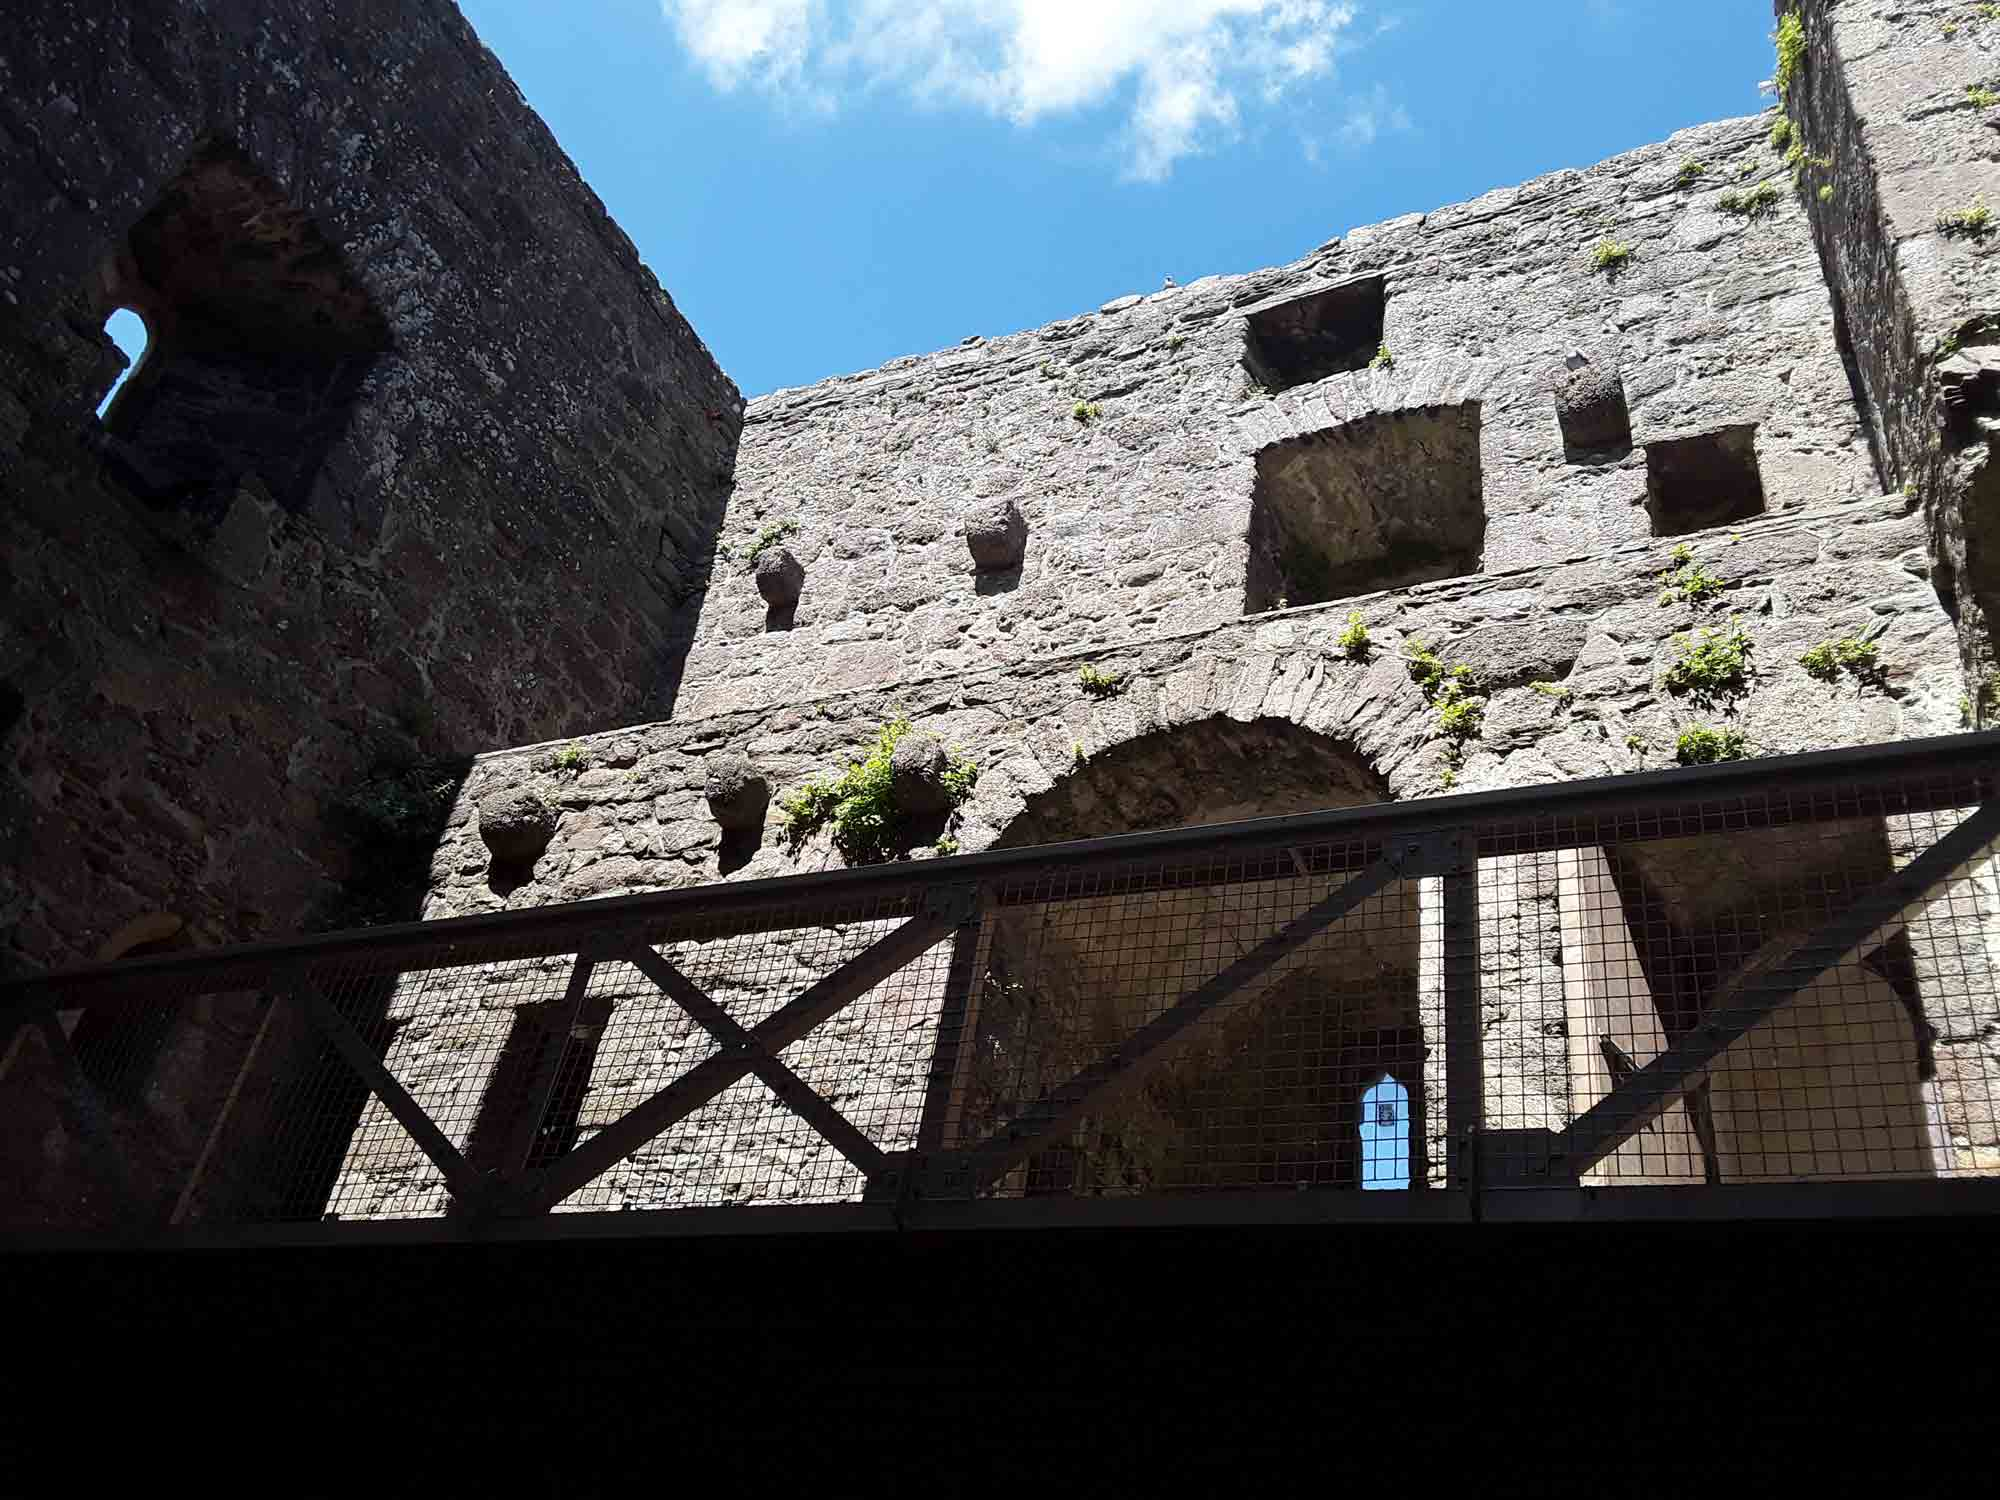 Interior Walls of Ballyhack Castle